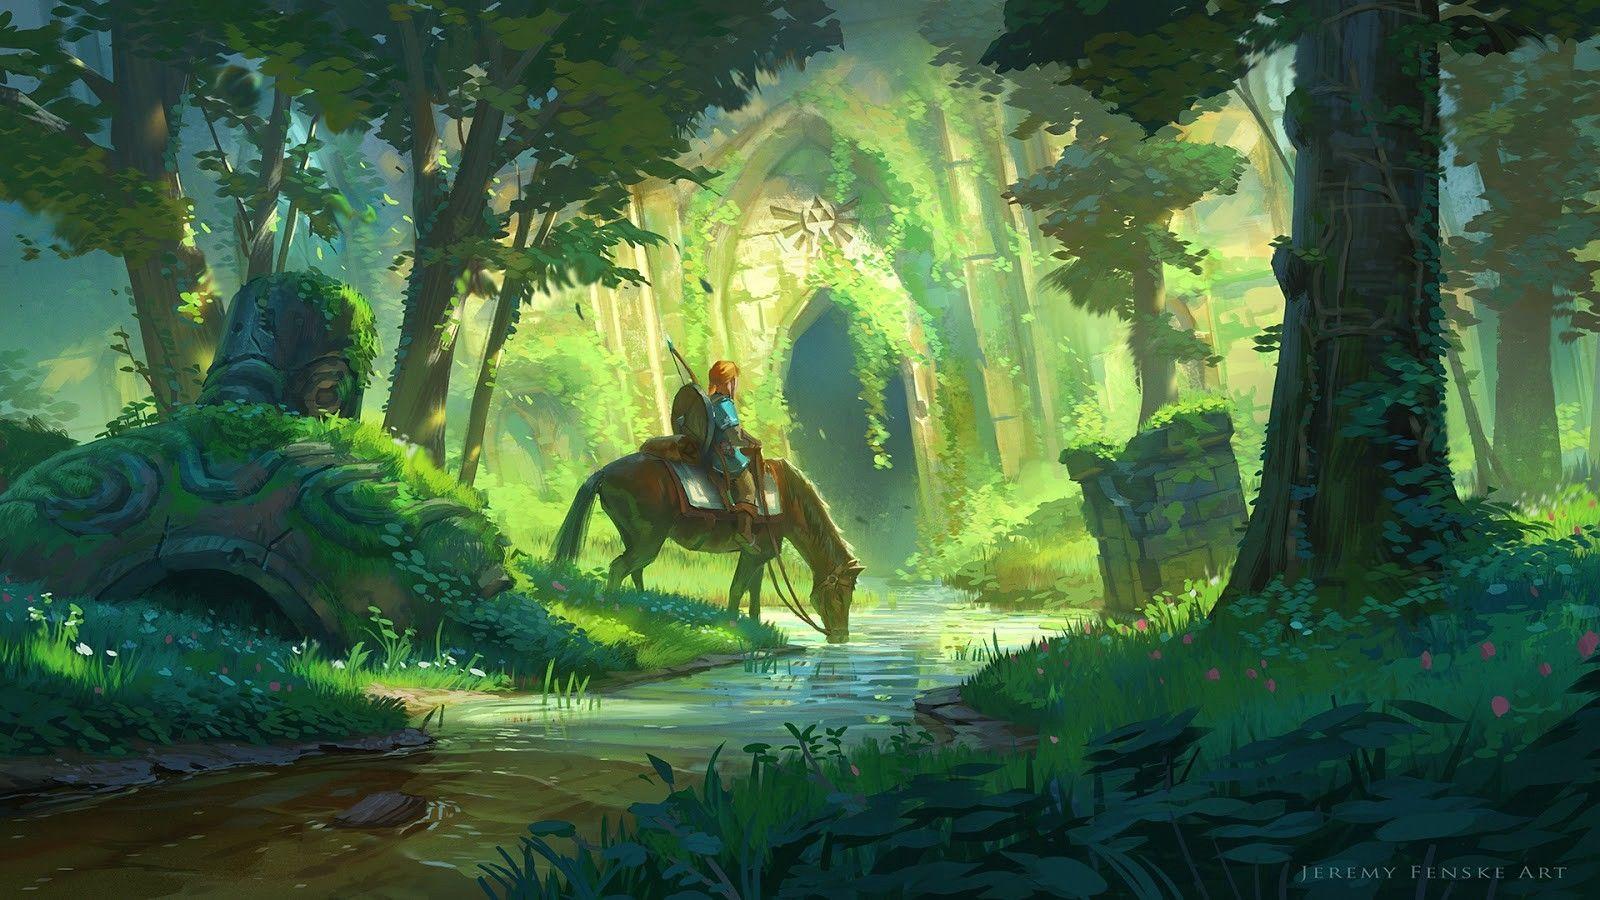 Pin De Hana En Art Zelda Fondo De Pantalla Legend Of Zelda Wallpaper Zelda Wallpaper